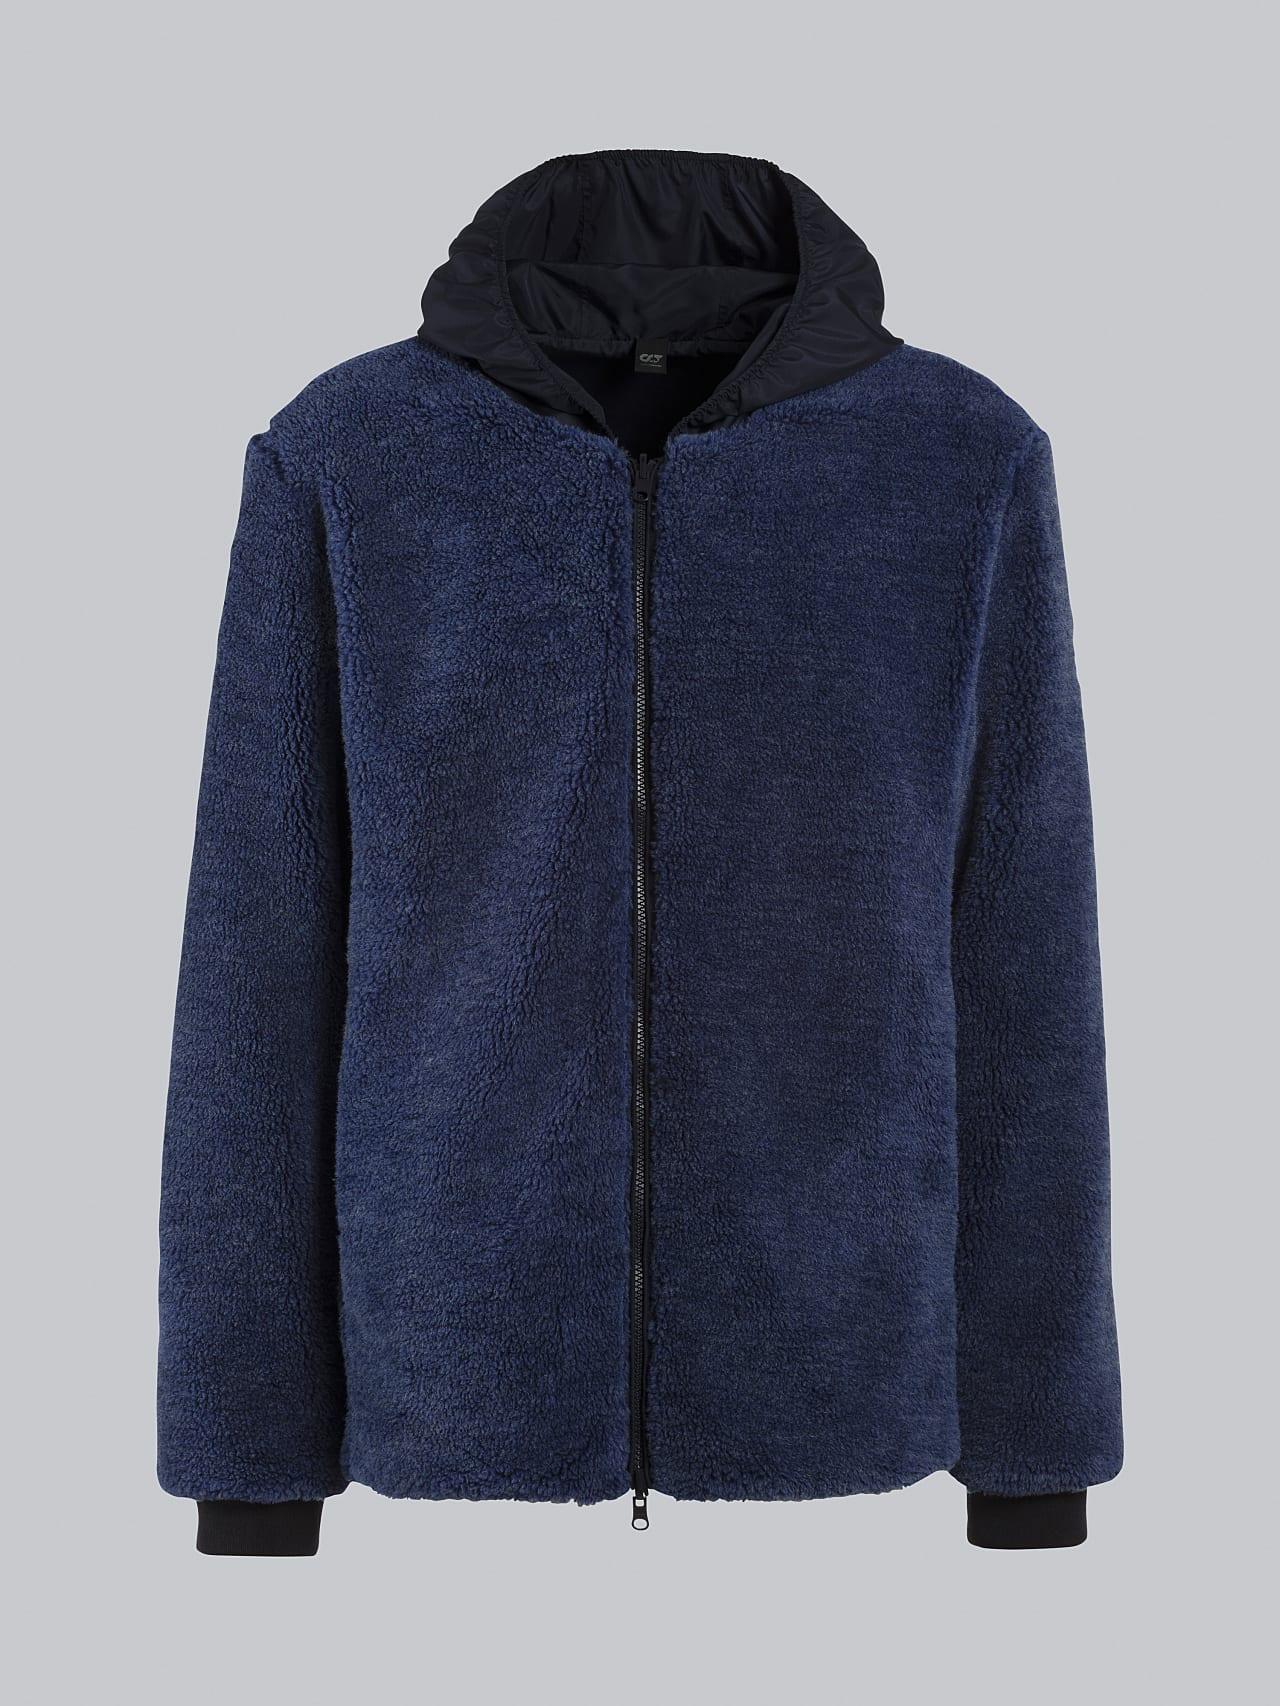 OVEDY V1.Y5.02 Reversible Wool-Blend Teddy Jacket light blue Back Alpha Tauri